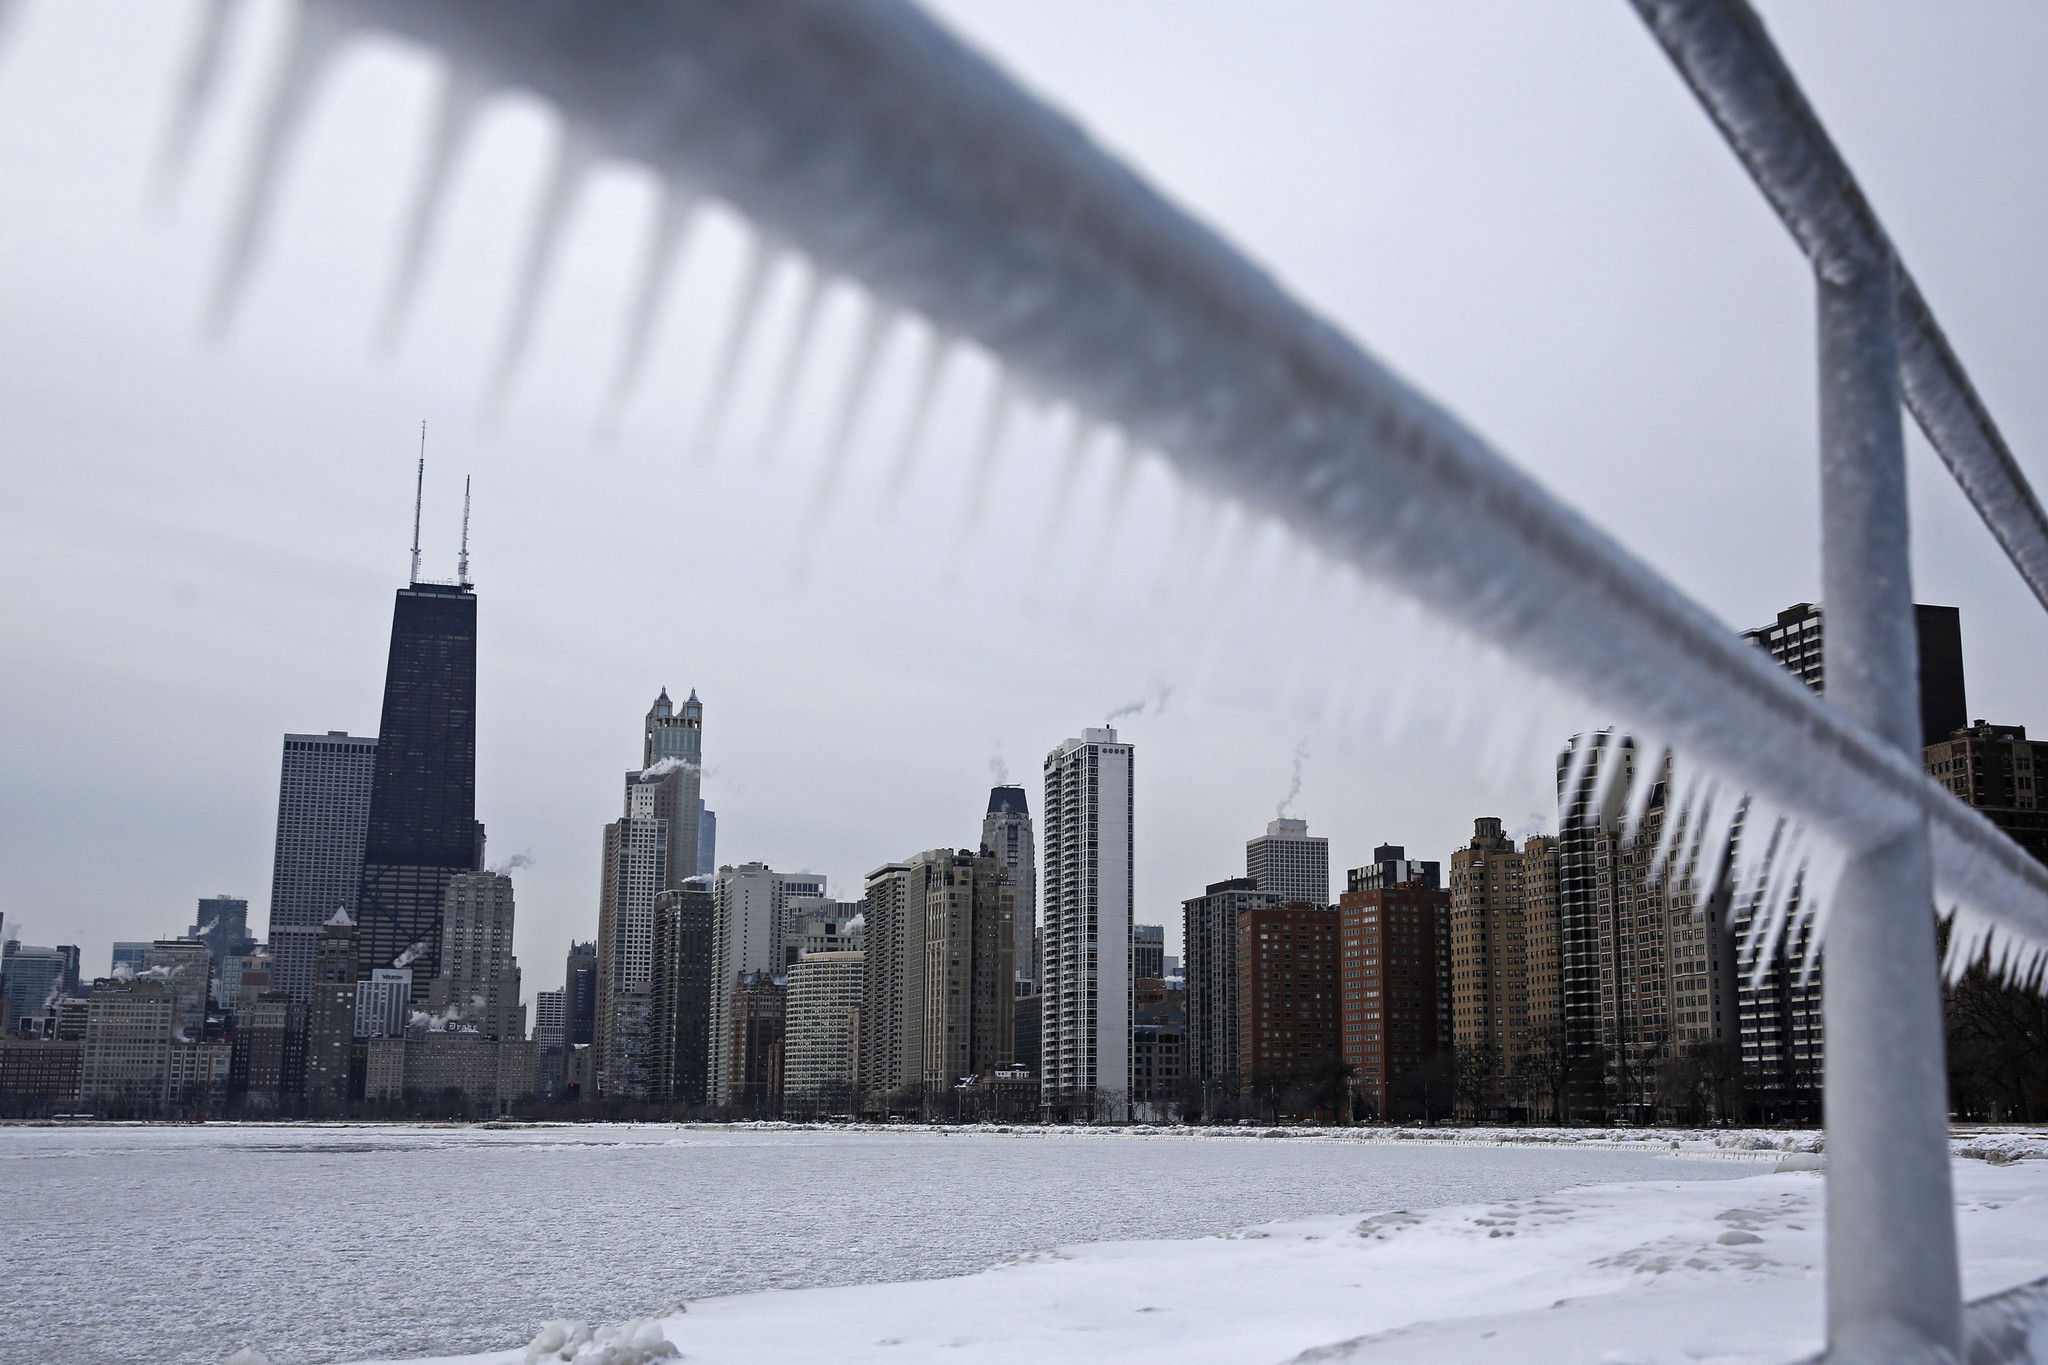 bundle up for below-zero temperatures by thursday